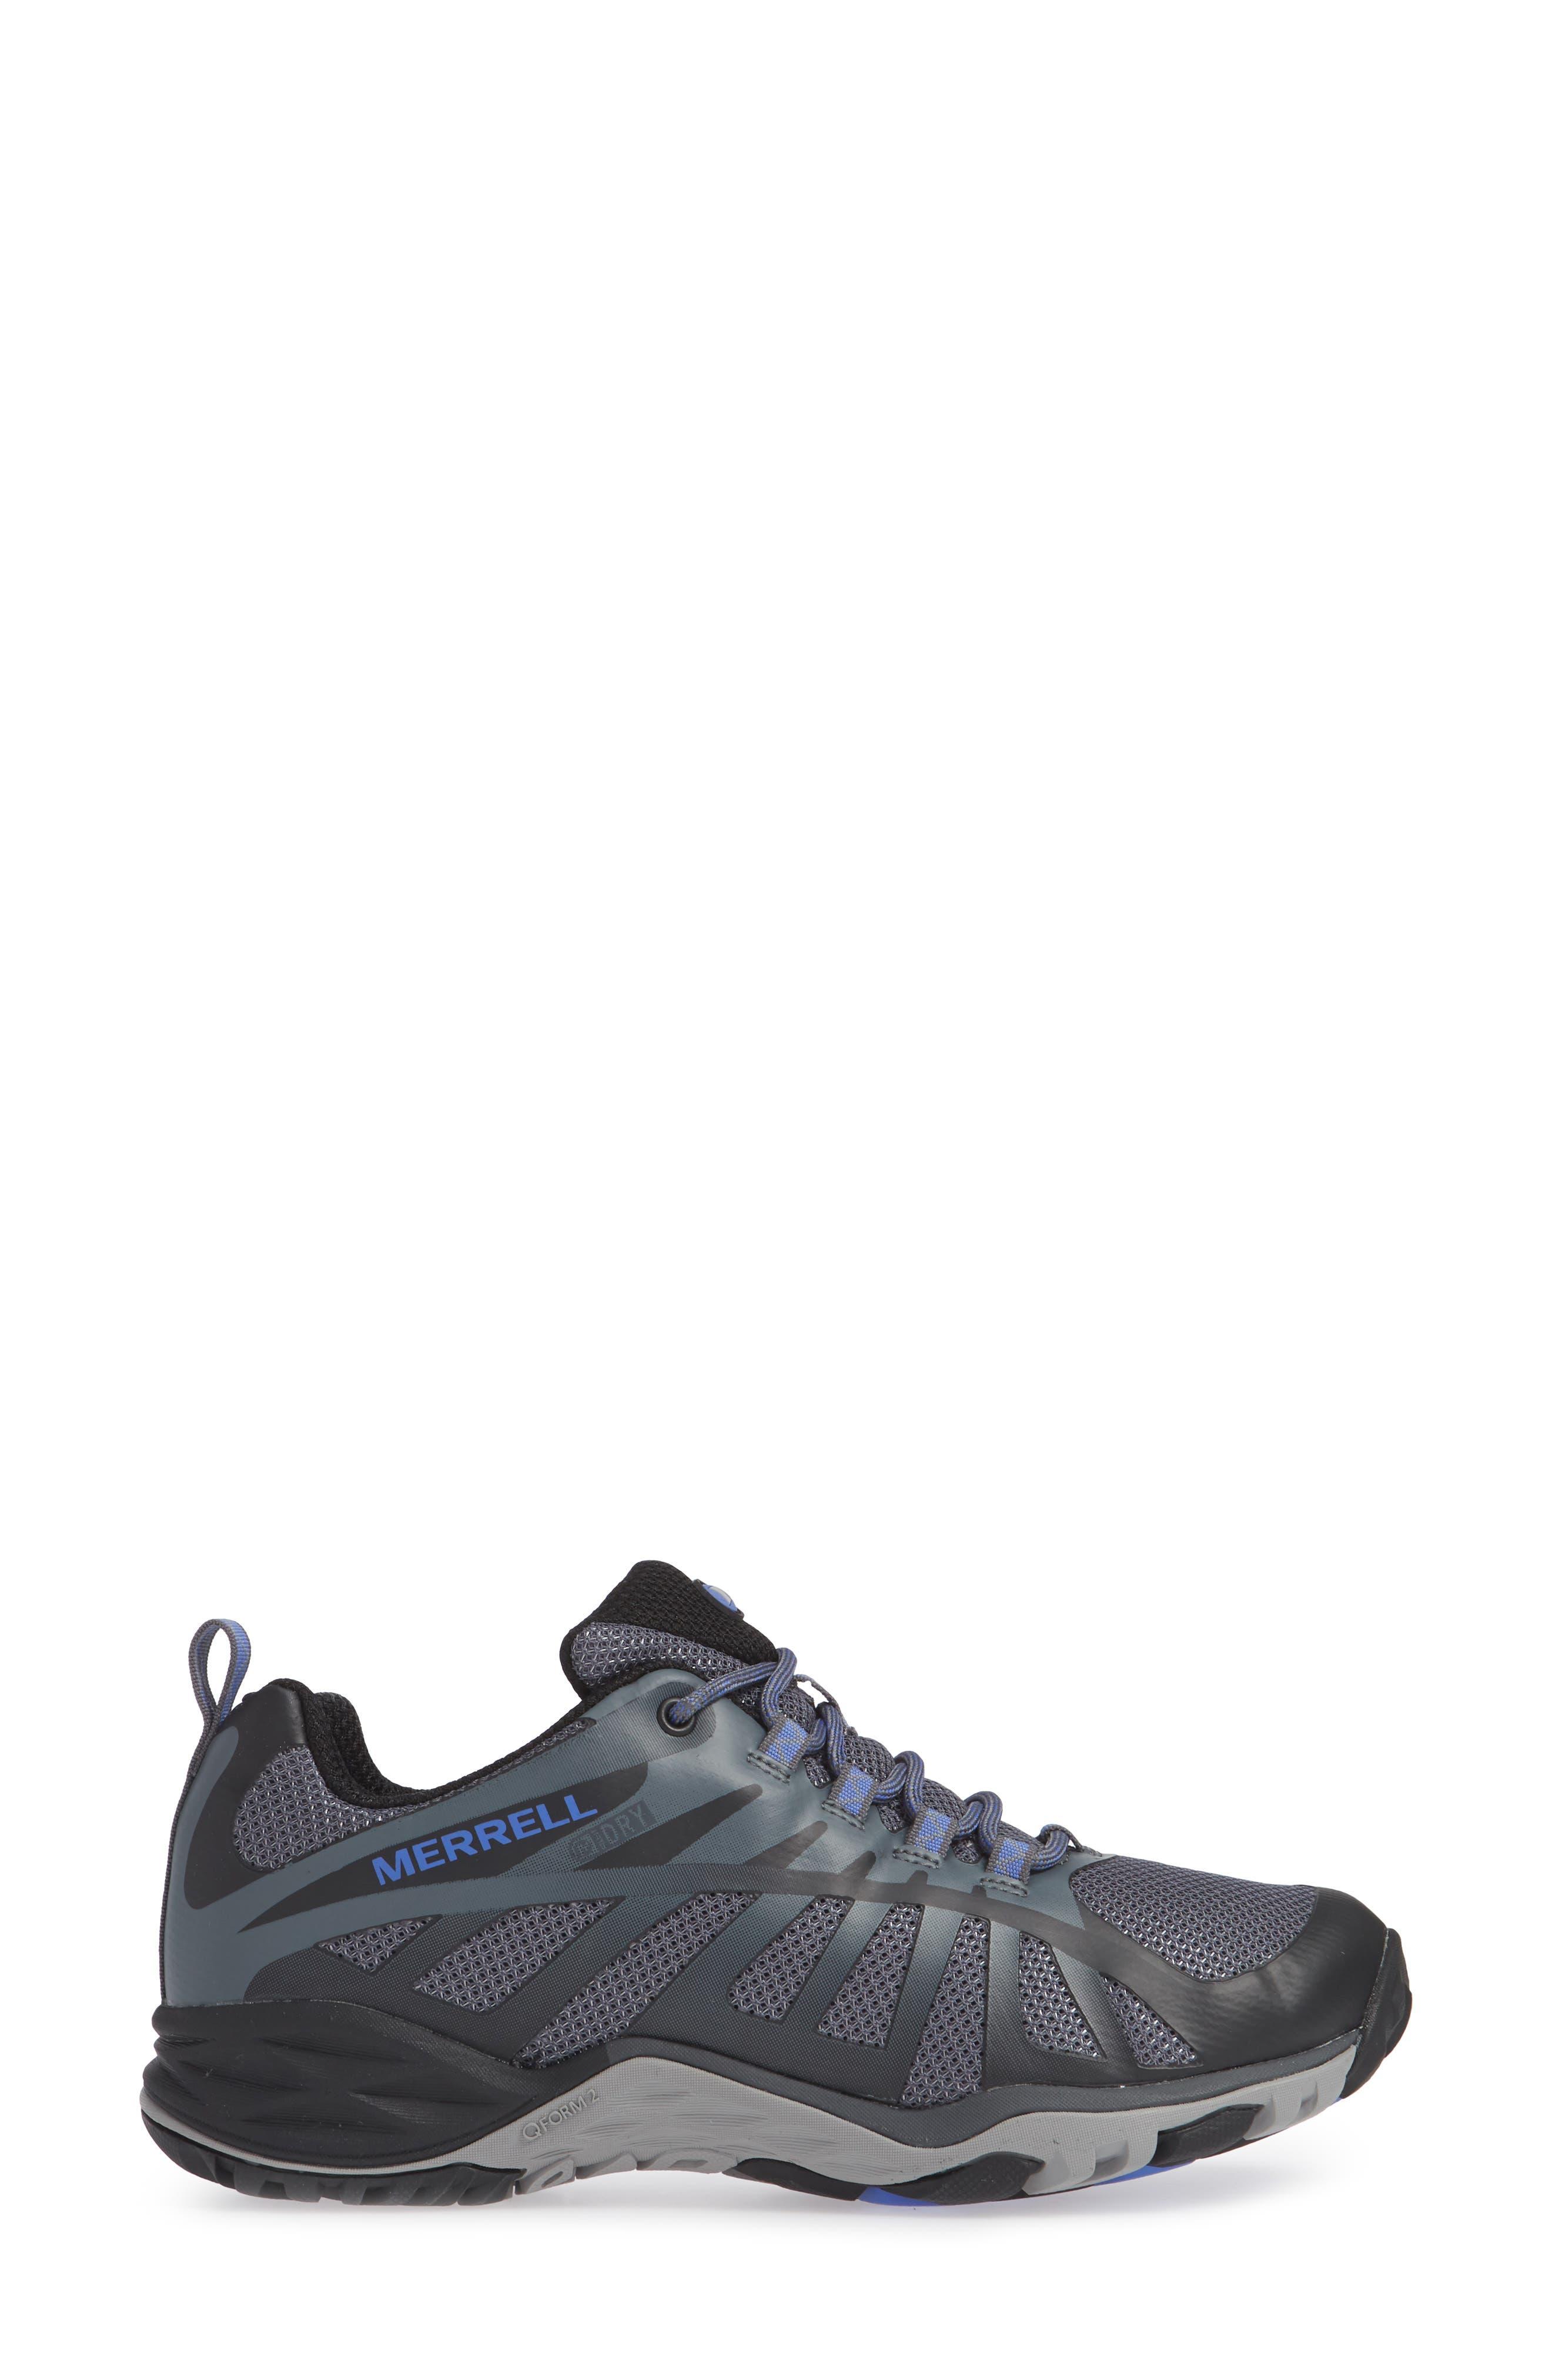 MERRELL, Siren Edge Waterproof Q2 Hiking Shoe, Alternate thumbnail 3, color, BLACK FABRIC